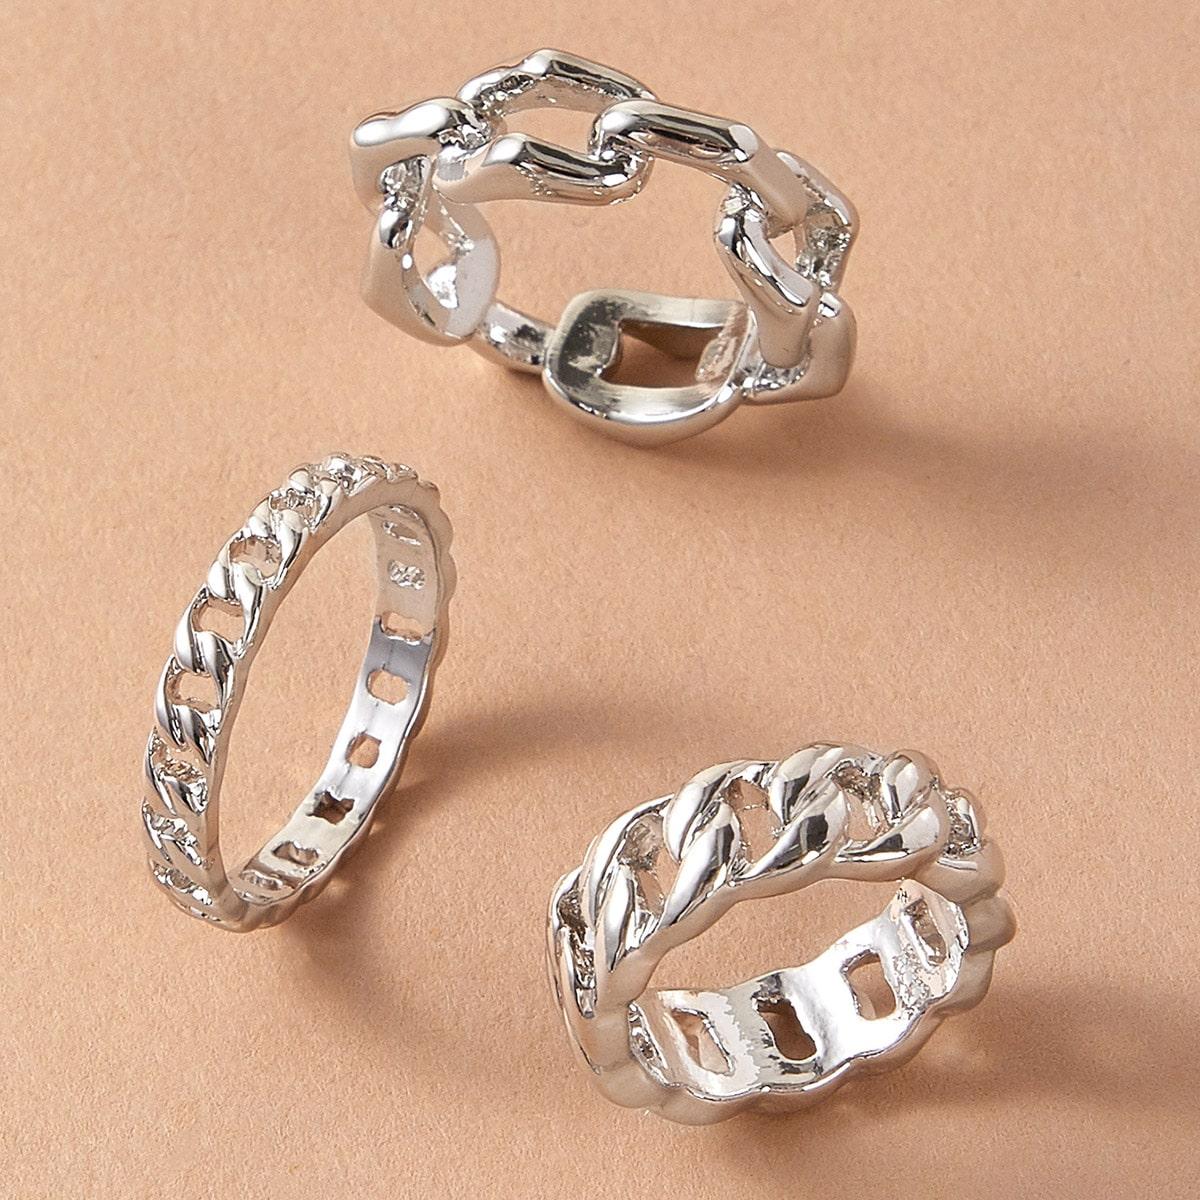 3pcs Link Decor Ring